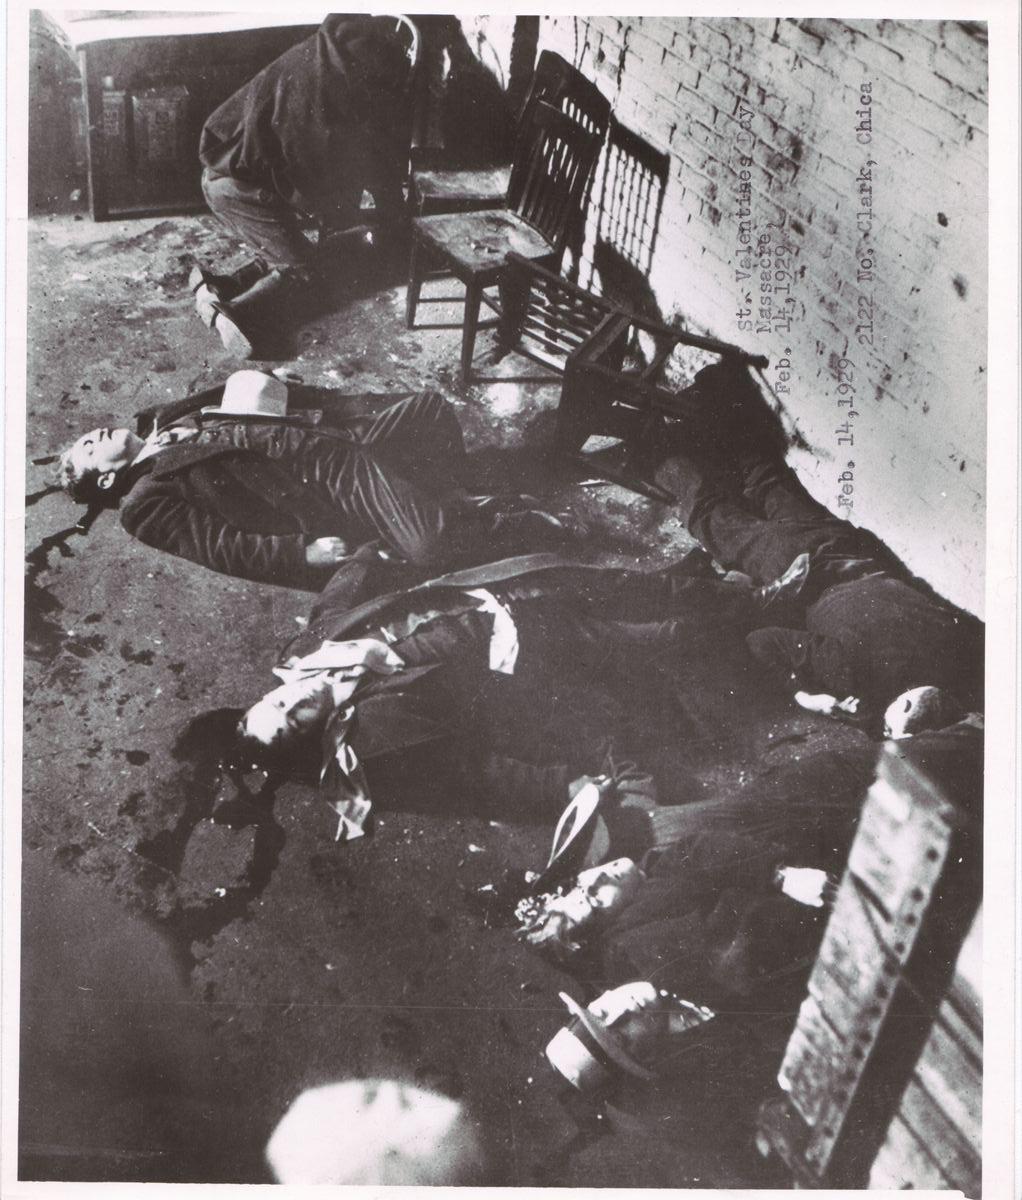 Aftermath of St. Valentine's Day Massacure 1929